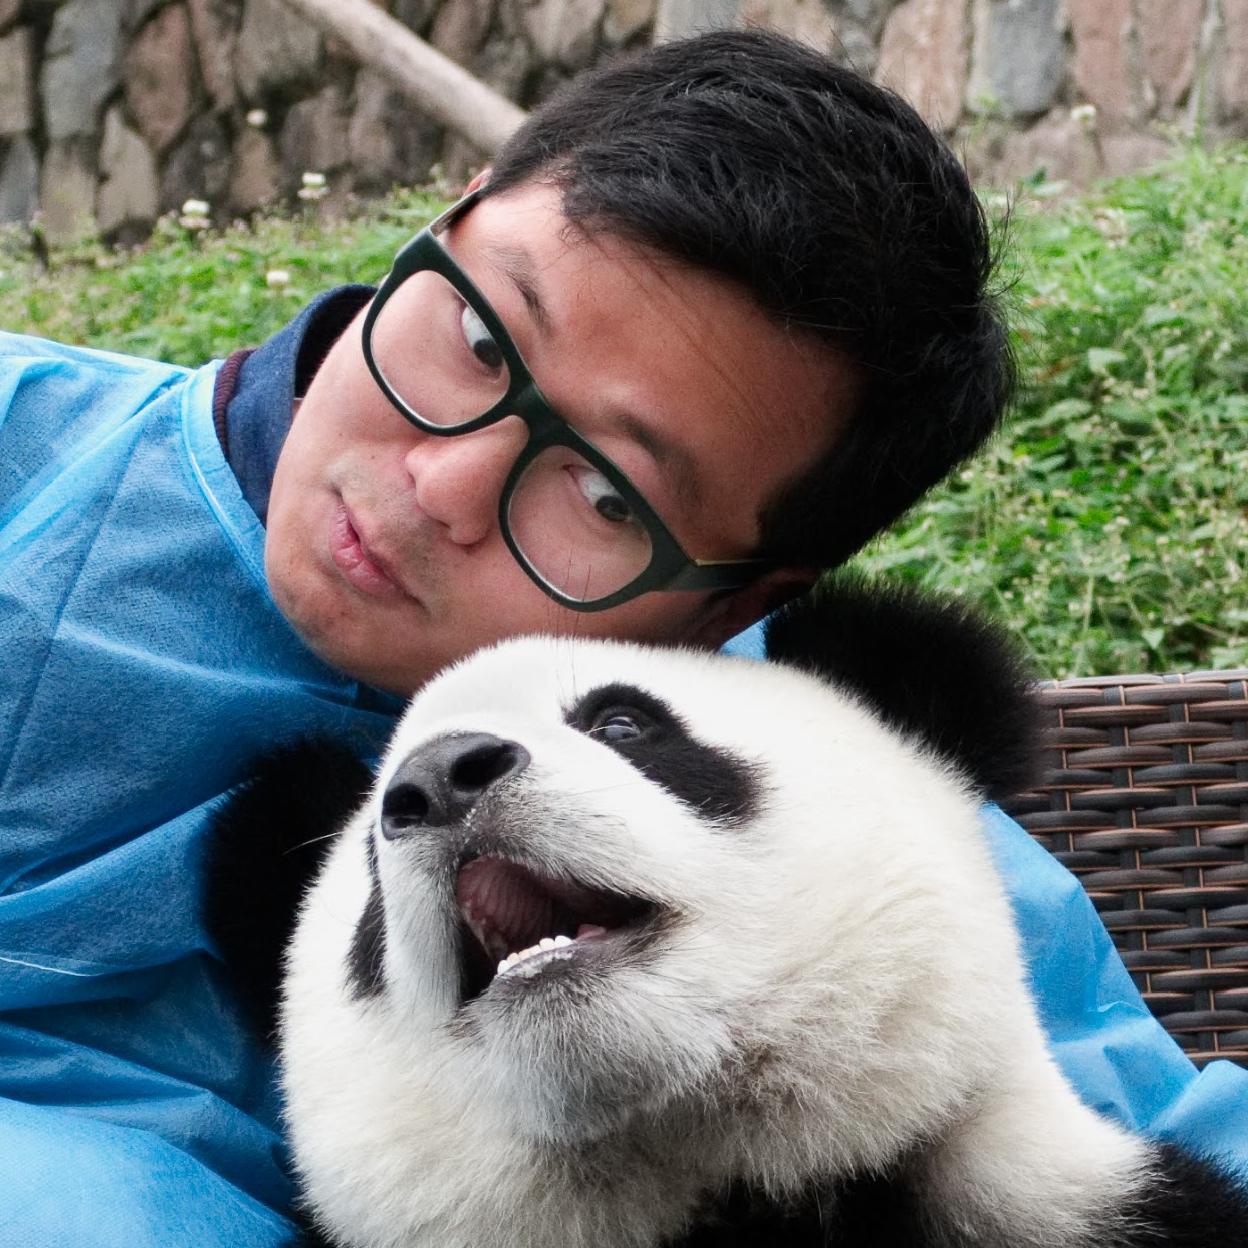 Ben with a baby panda